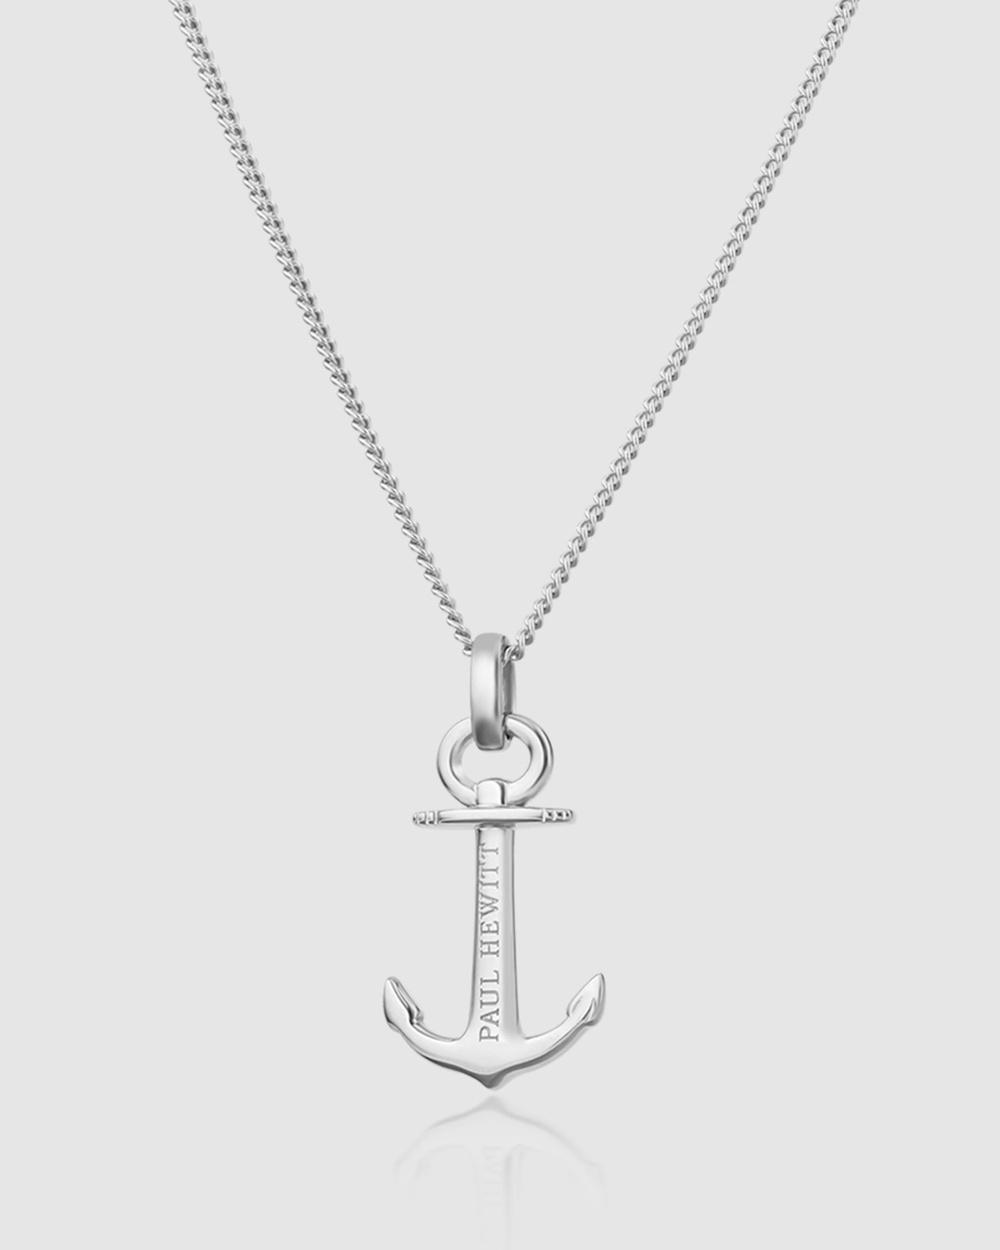 Paul Hewitt Anchor Spirit Necklace Jewellery Silver